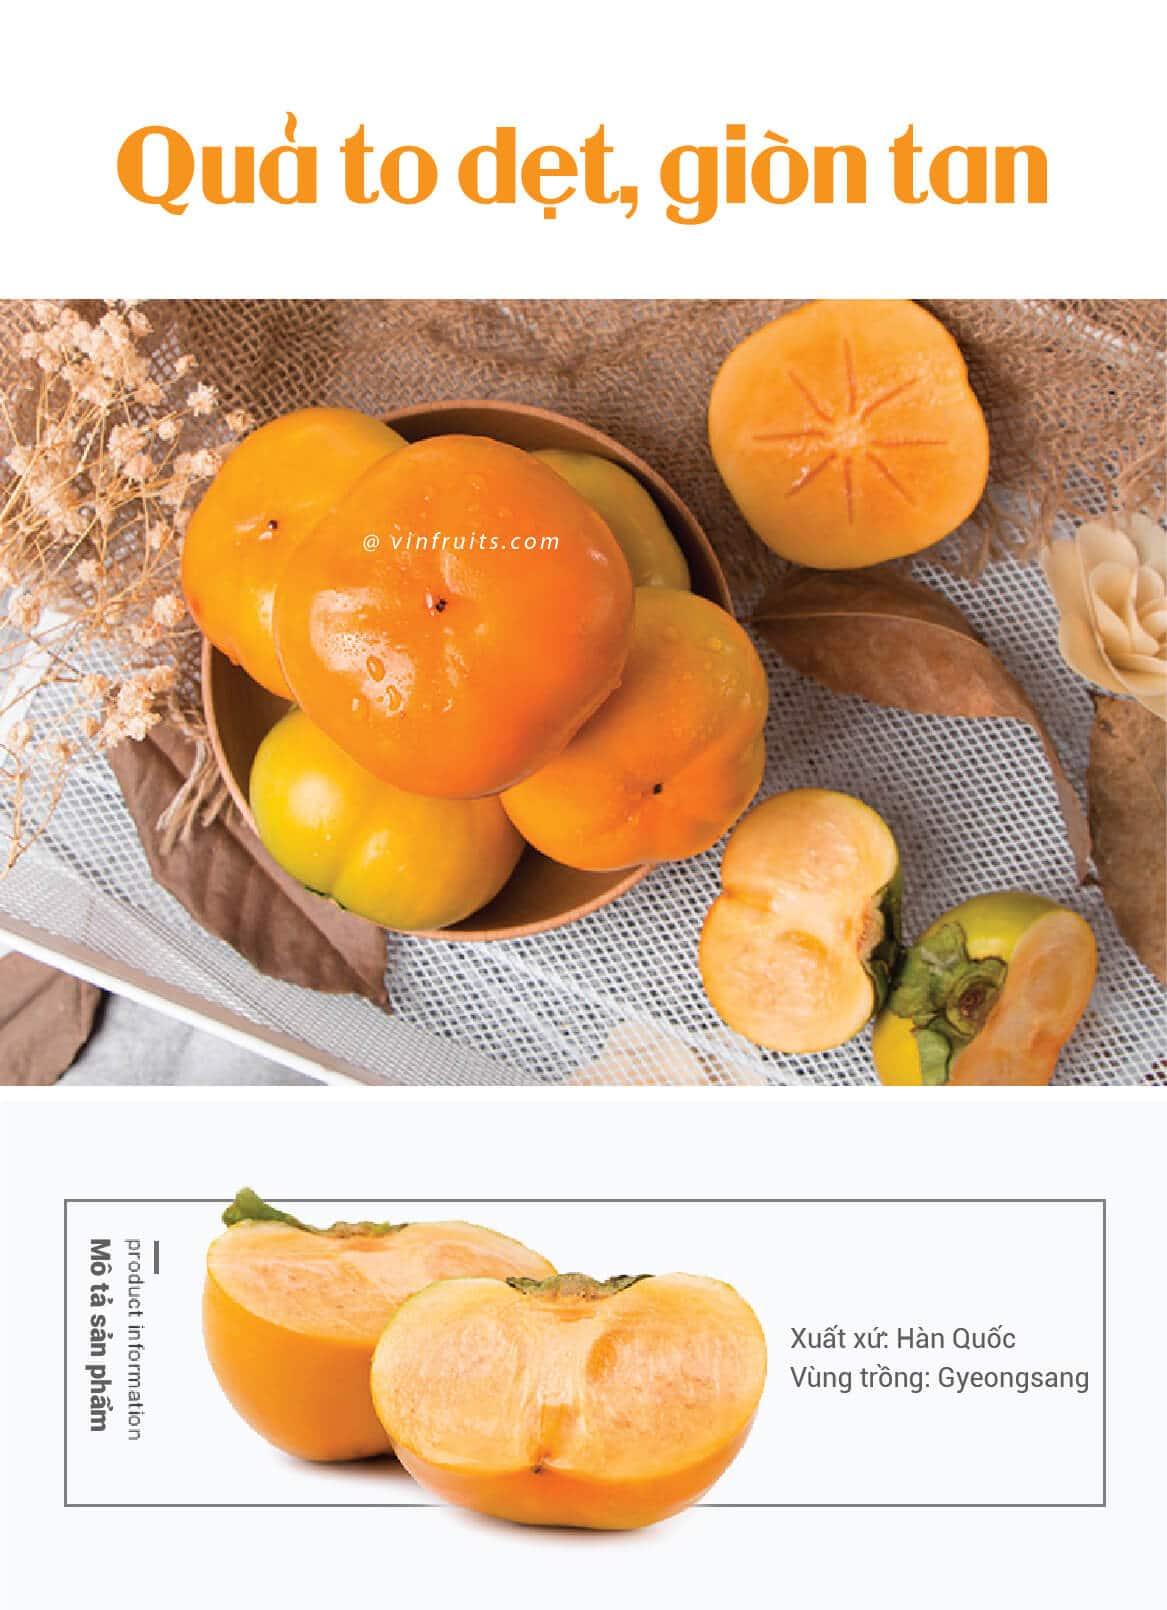 Hong gion Han Quoc - vinfruits 2